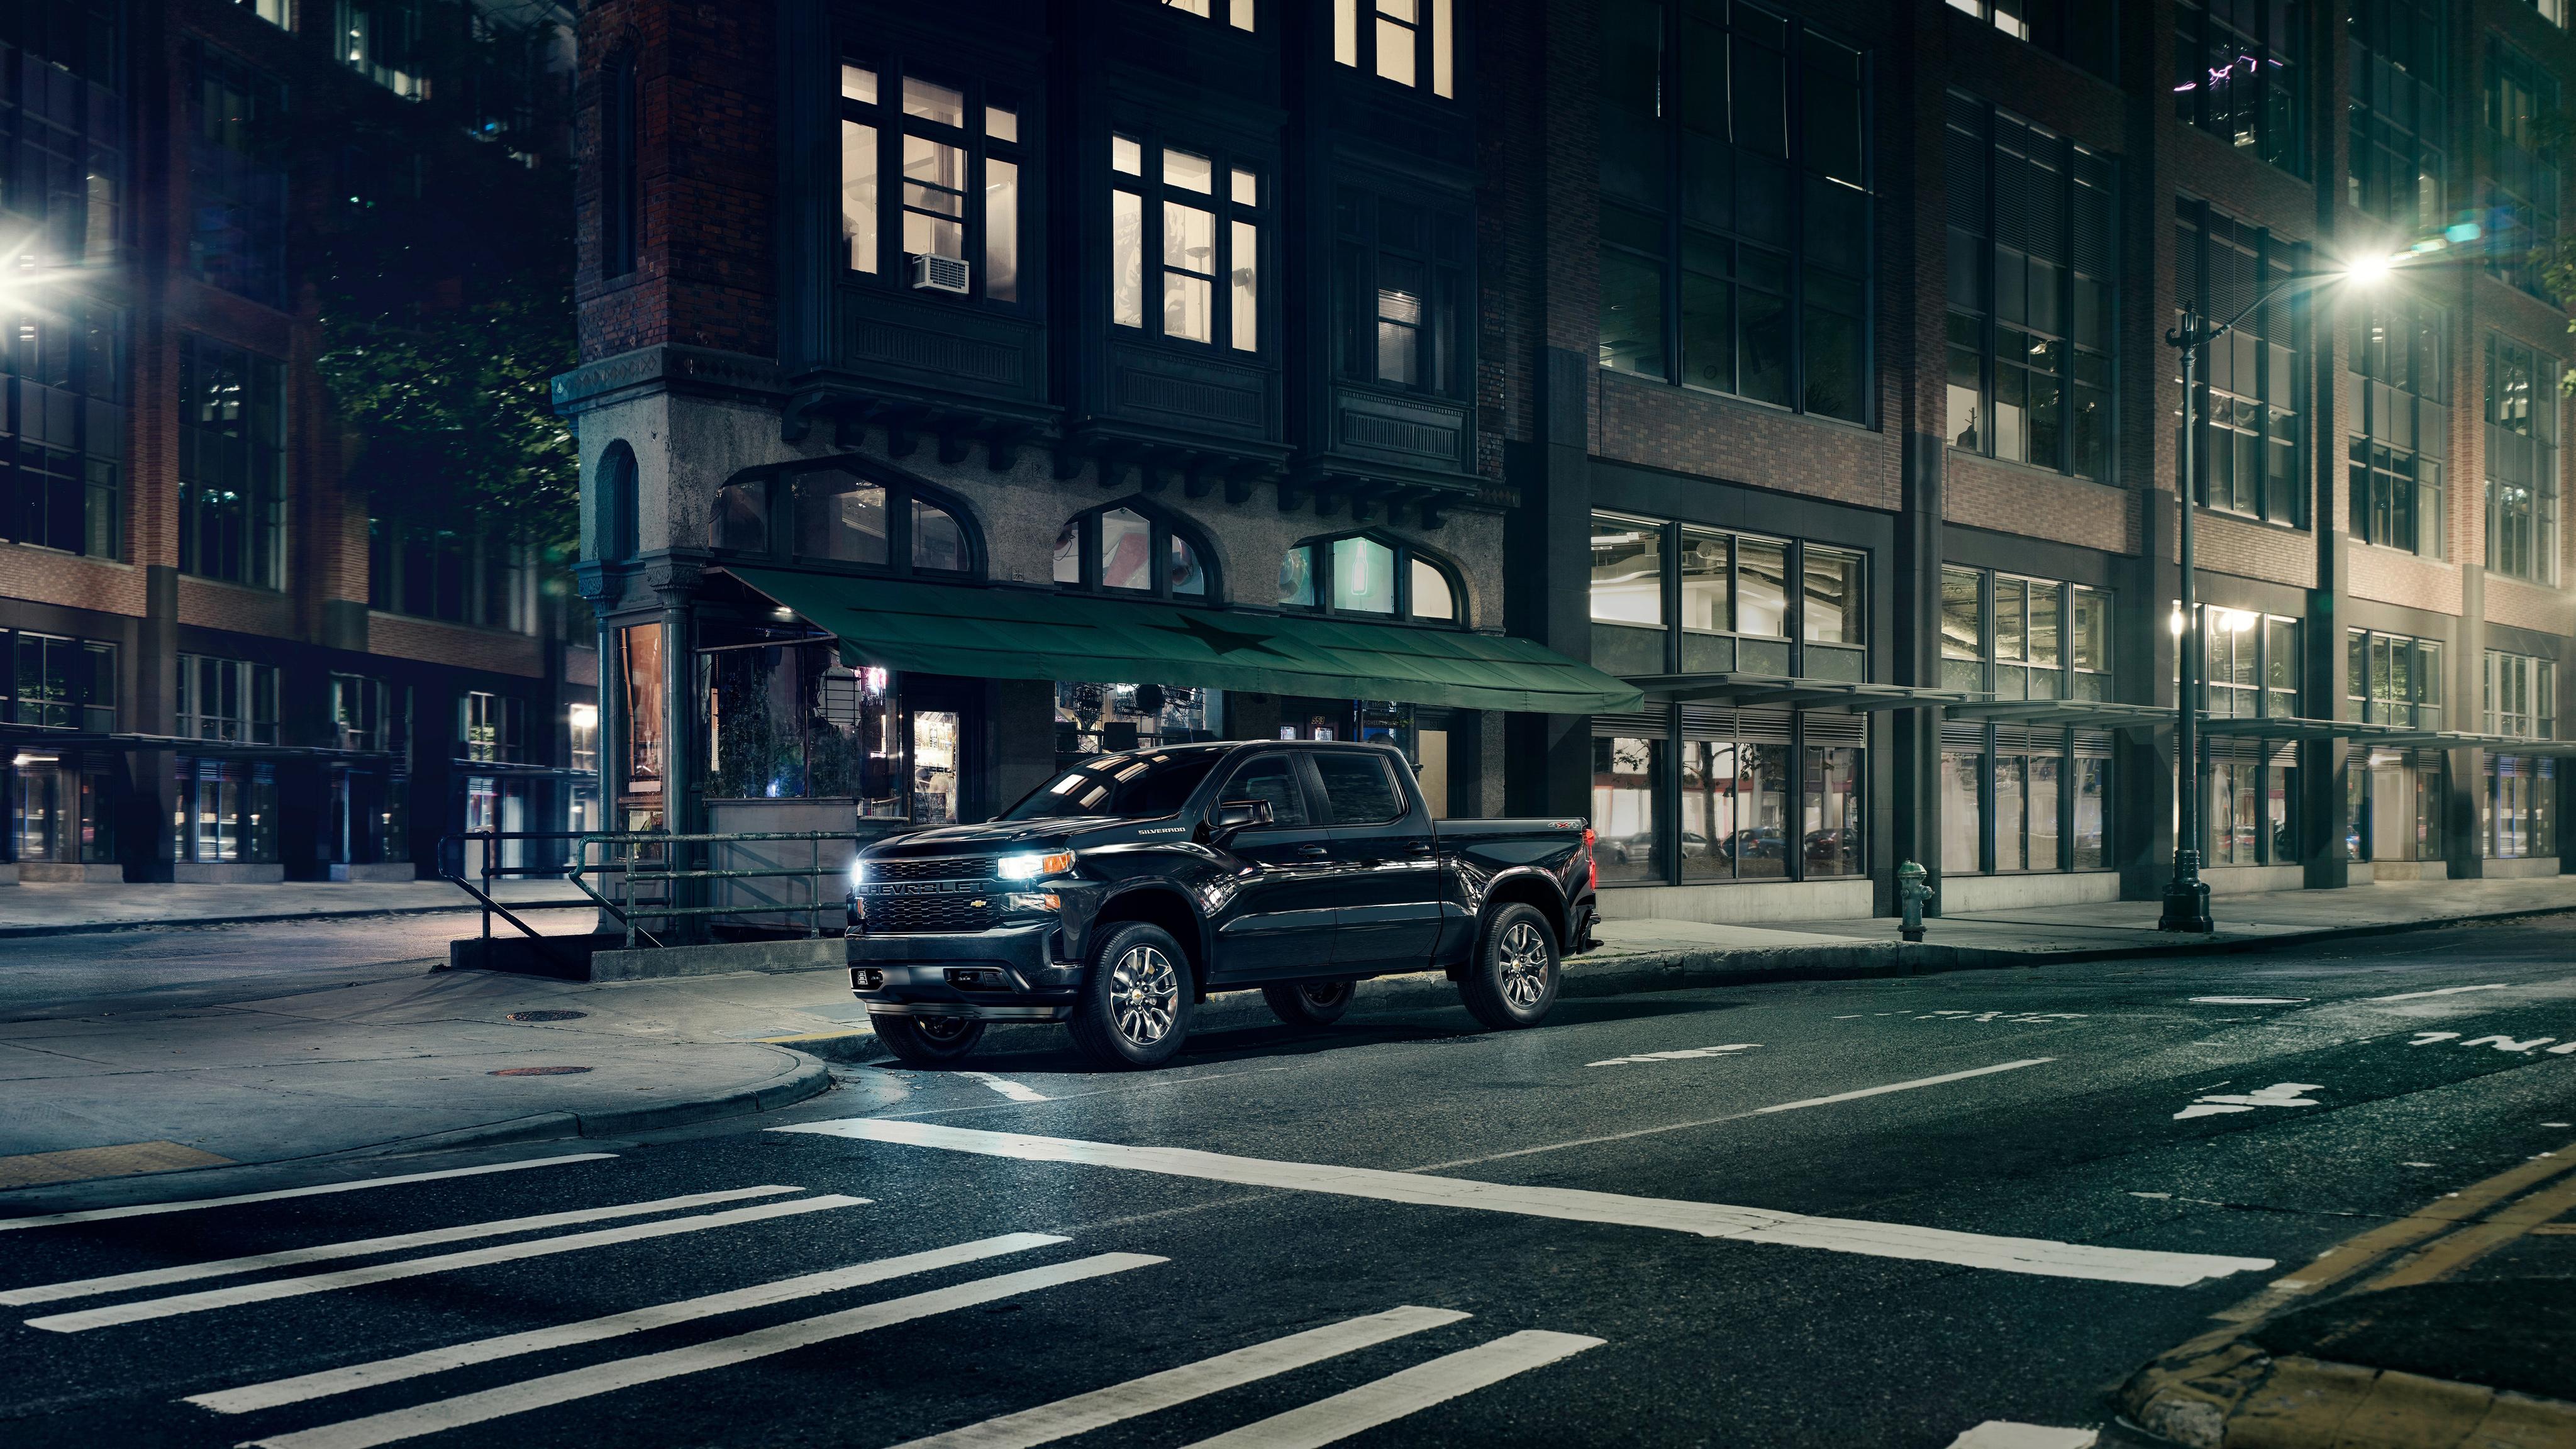 2018 Chevrolet Silverado Custom Crew Cab 4K Wallpaper | HD ...